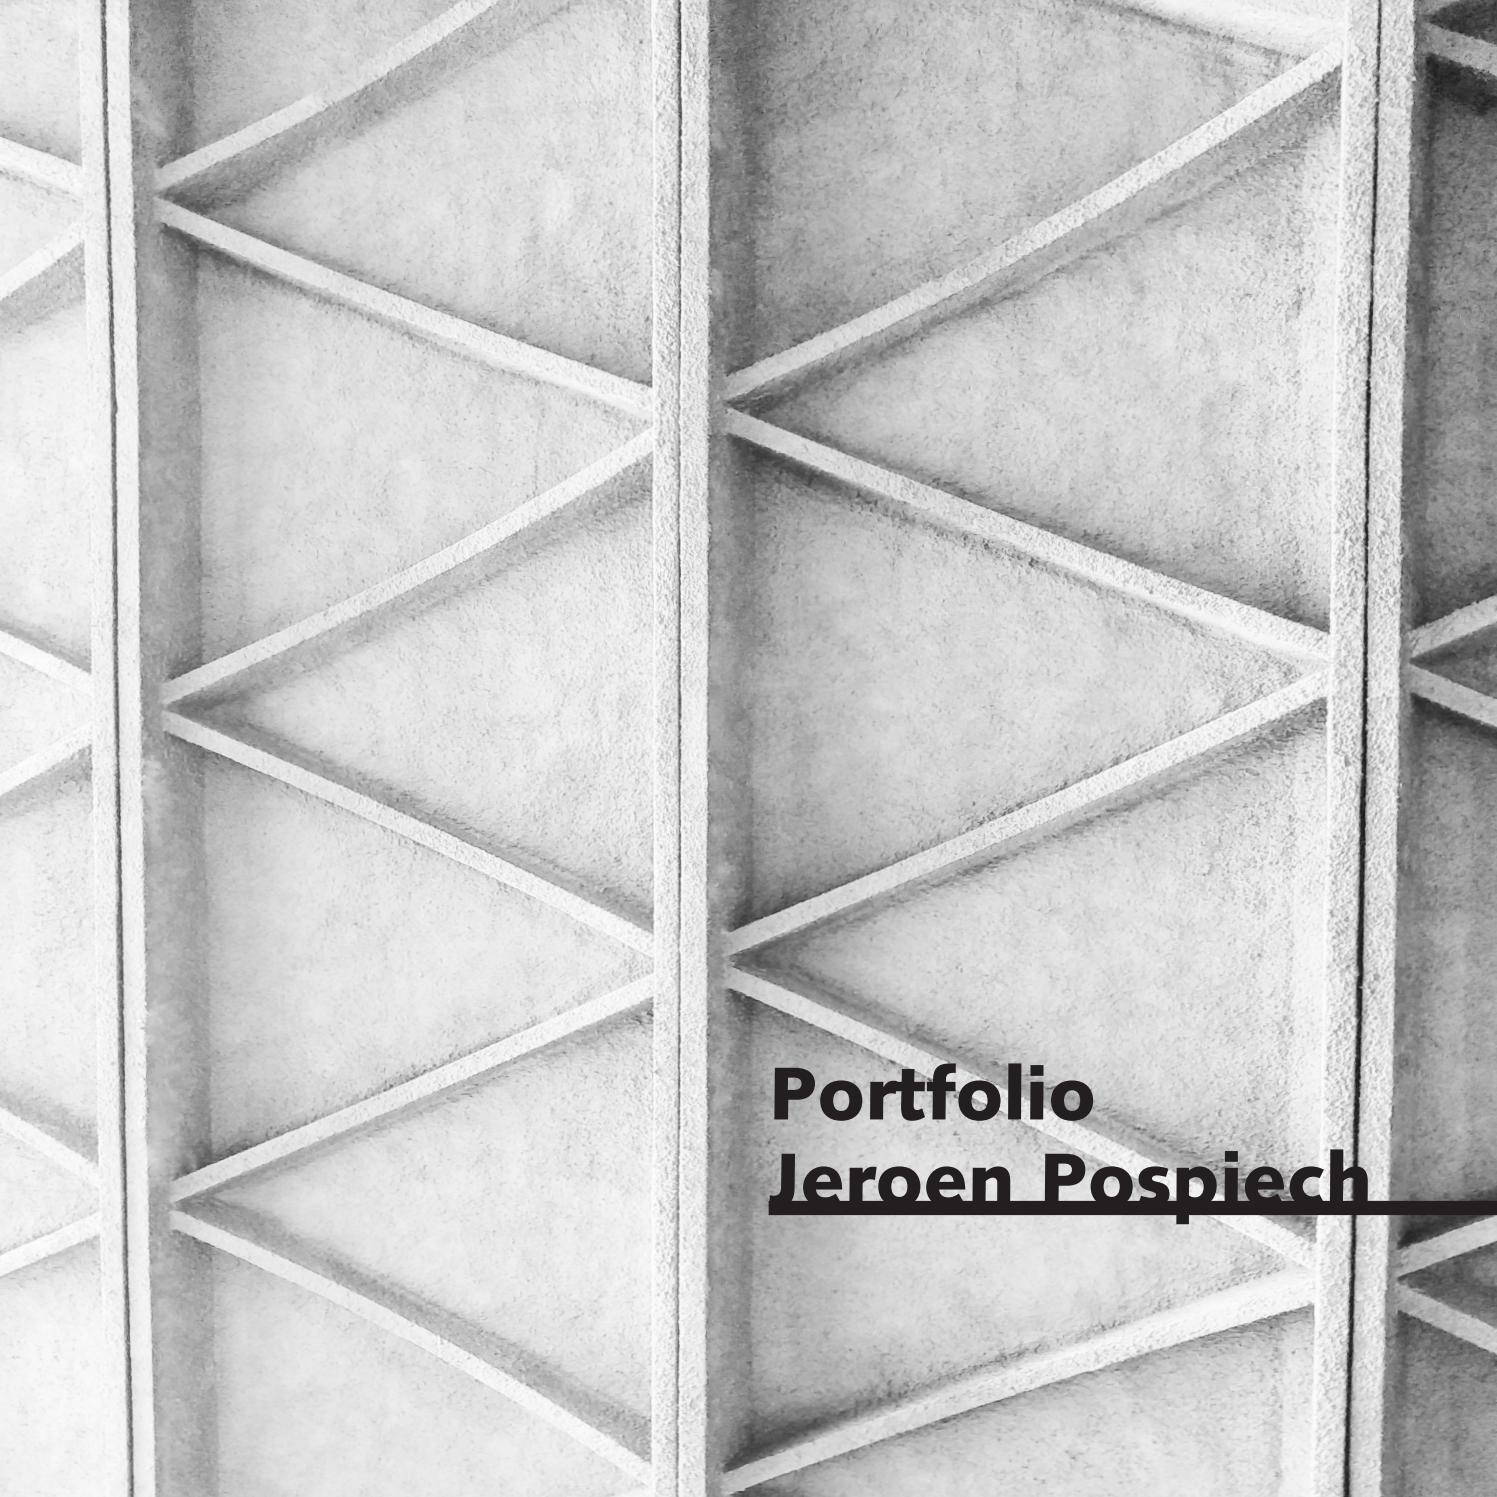 Portfolio By Jeroen Pospiech